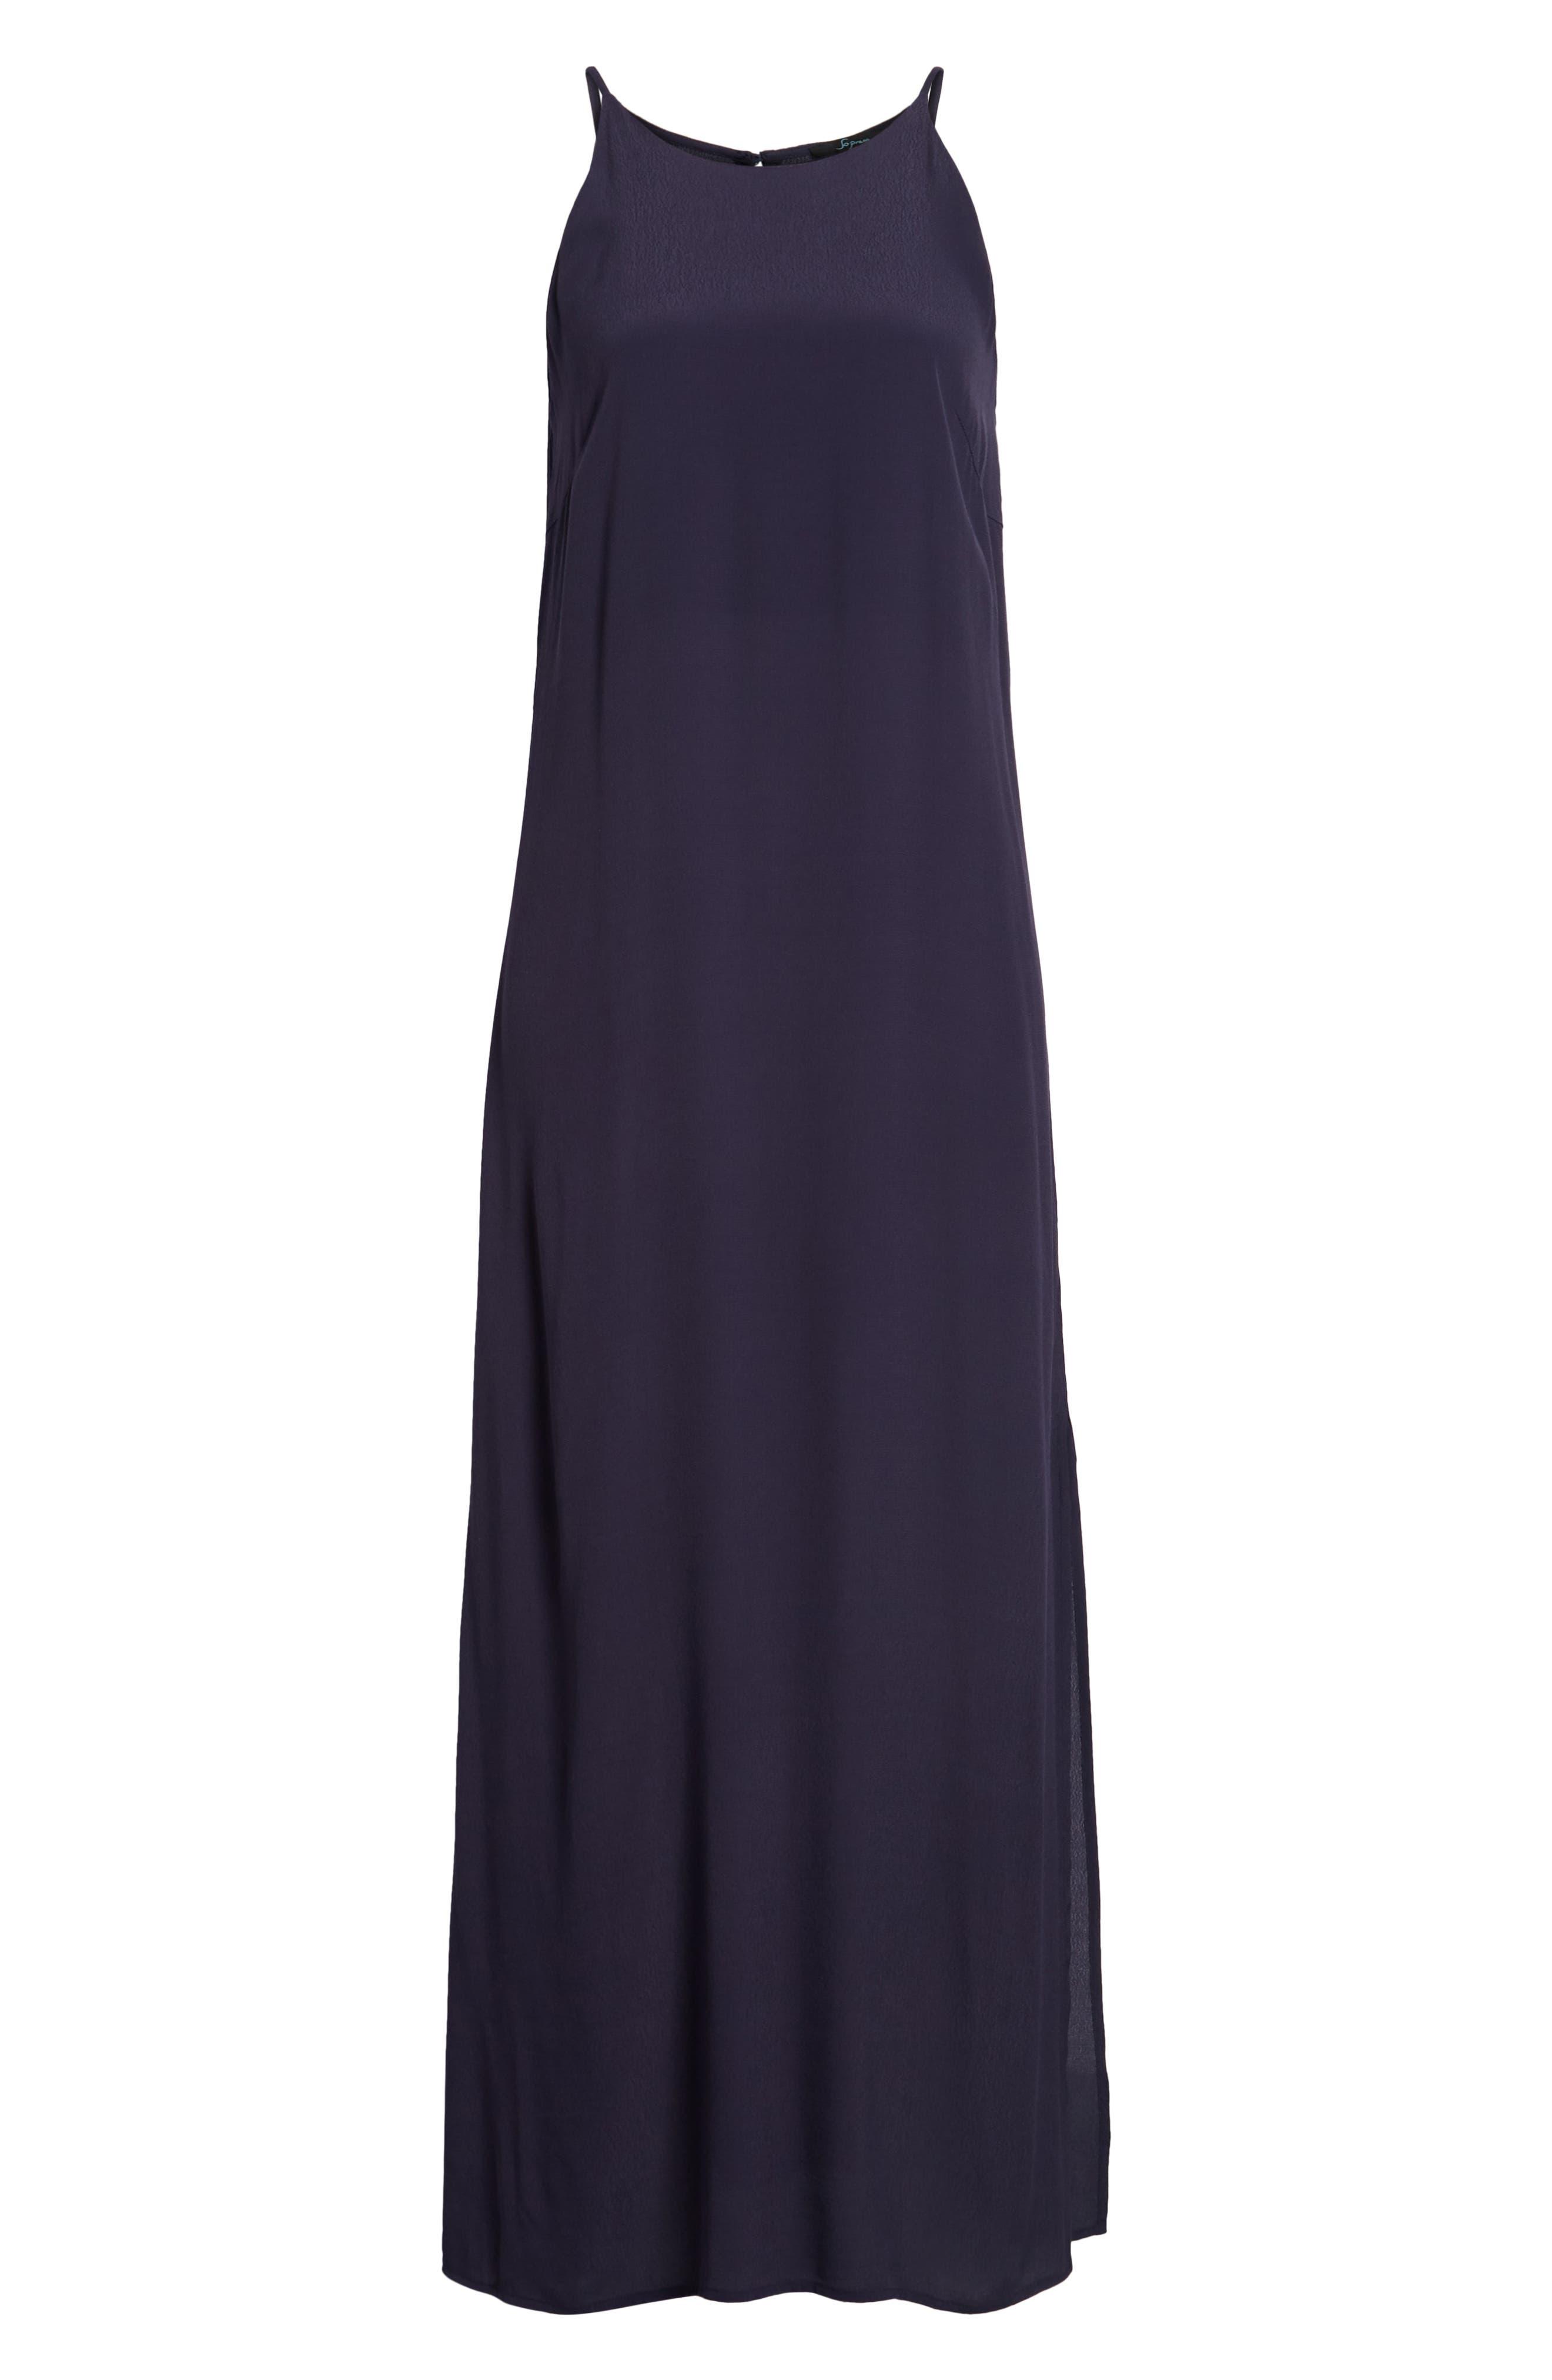 Maxi Dress,                             Alternate thumbnail 7, color,                             Navy